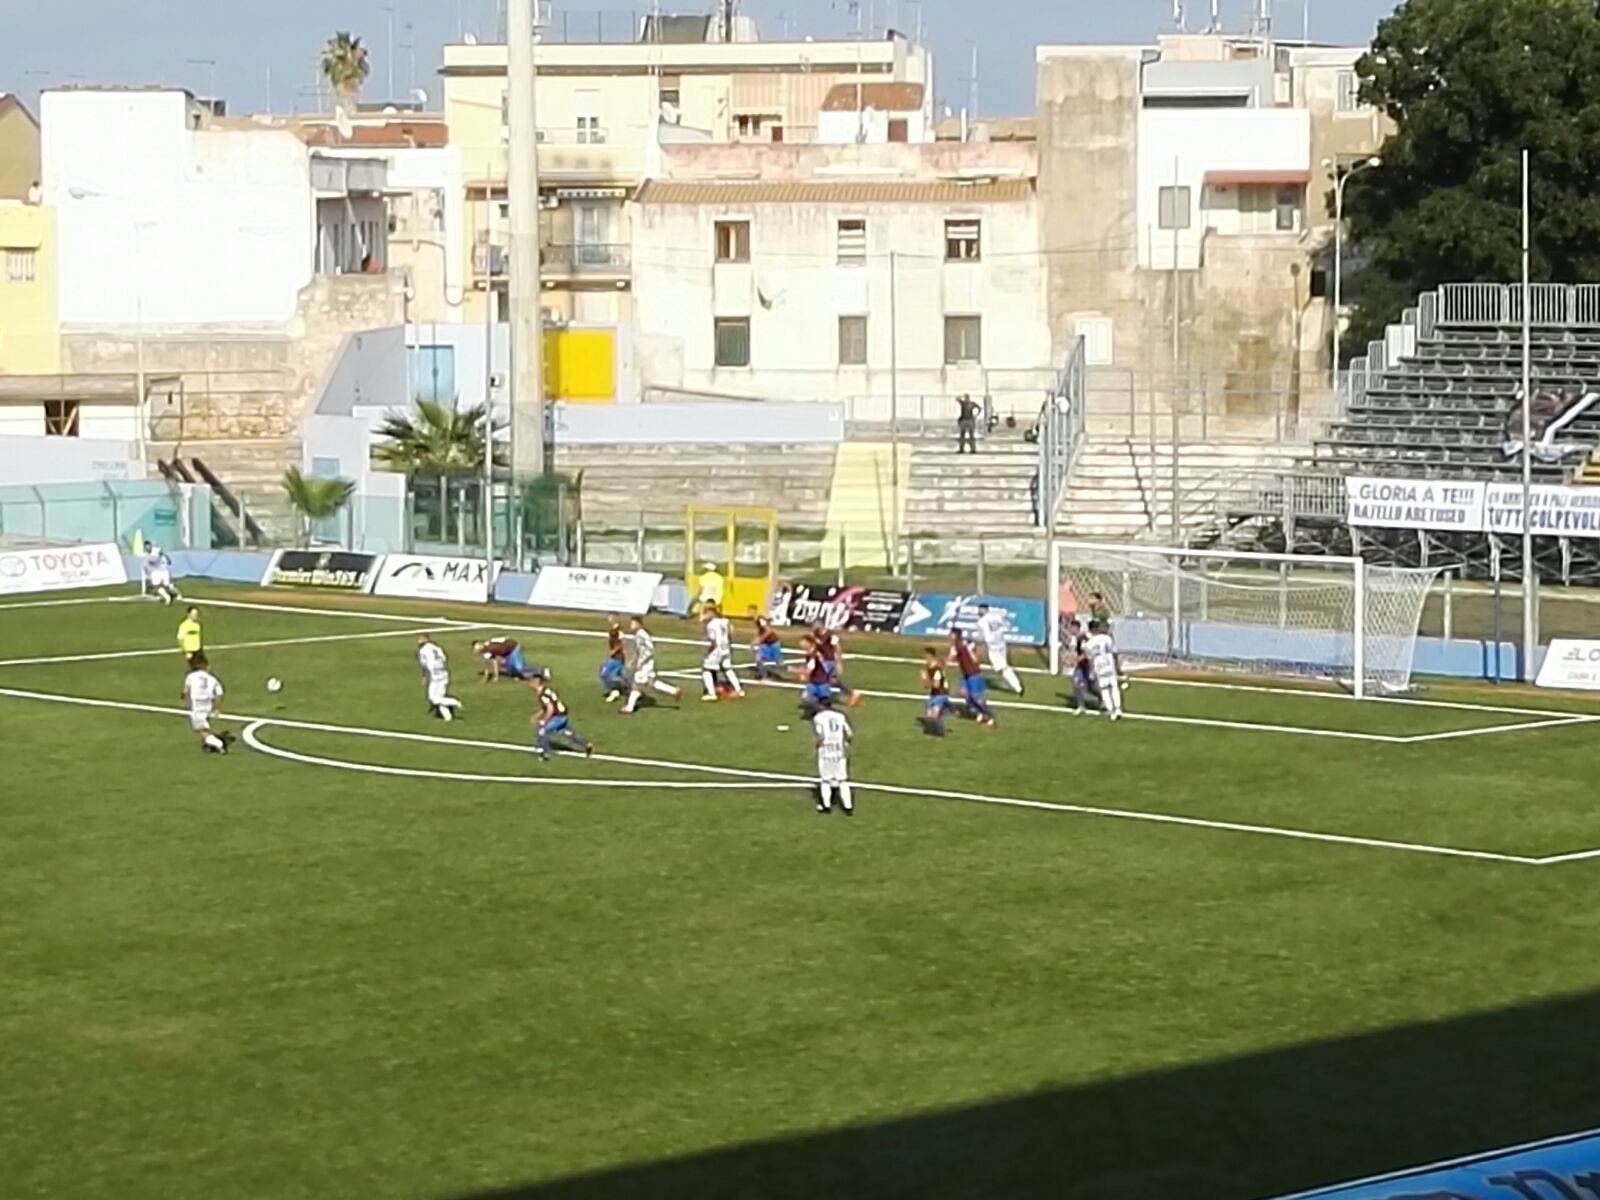 Serie C, niente da fare per l'Akragas: al Siracusa il derby